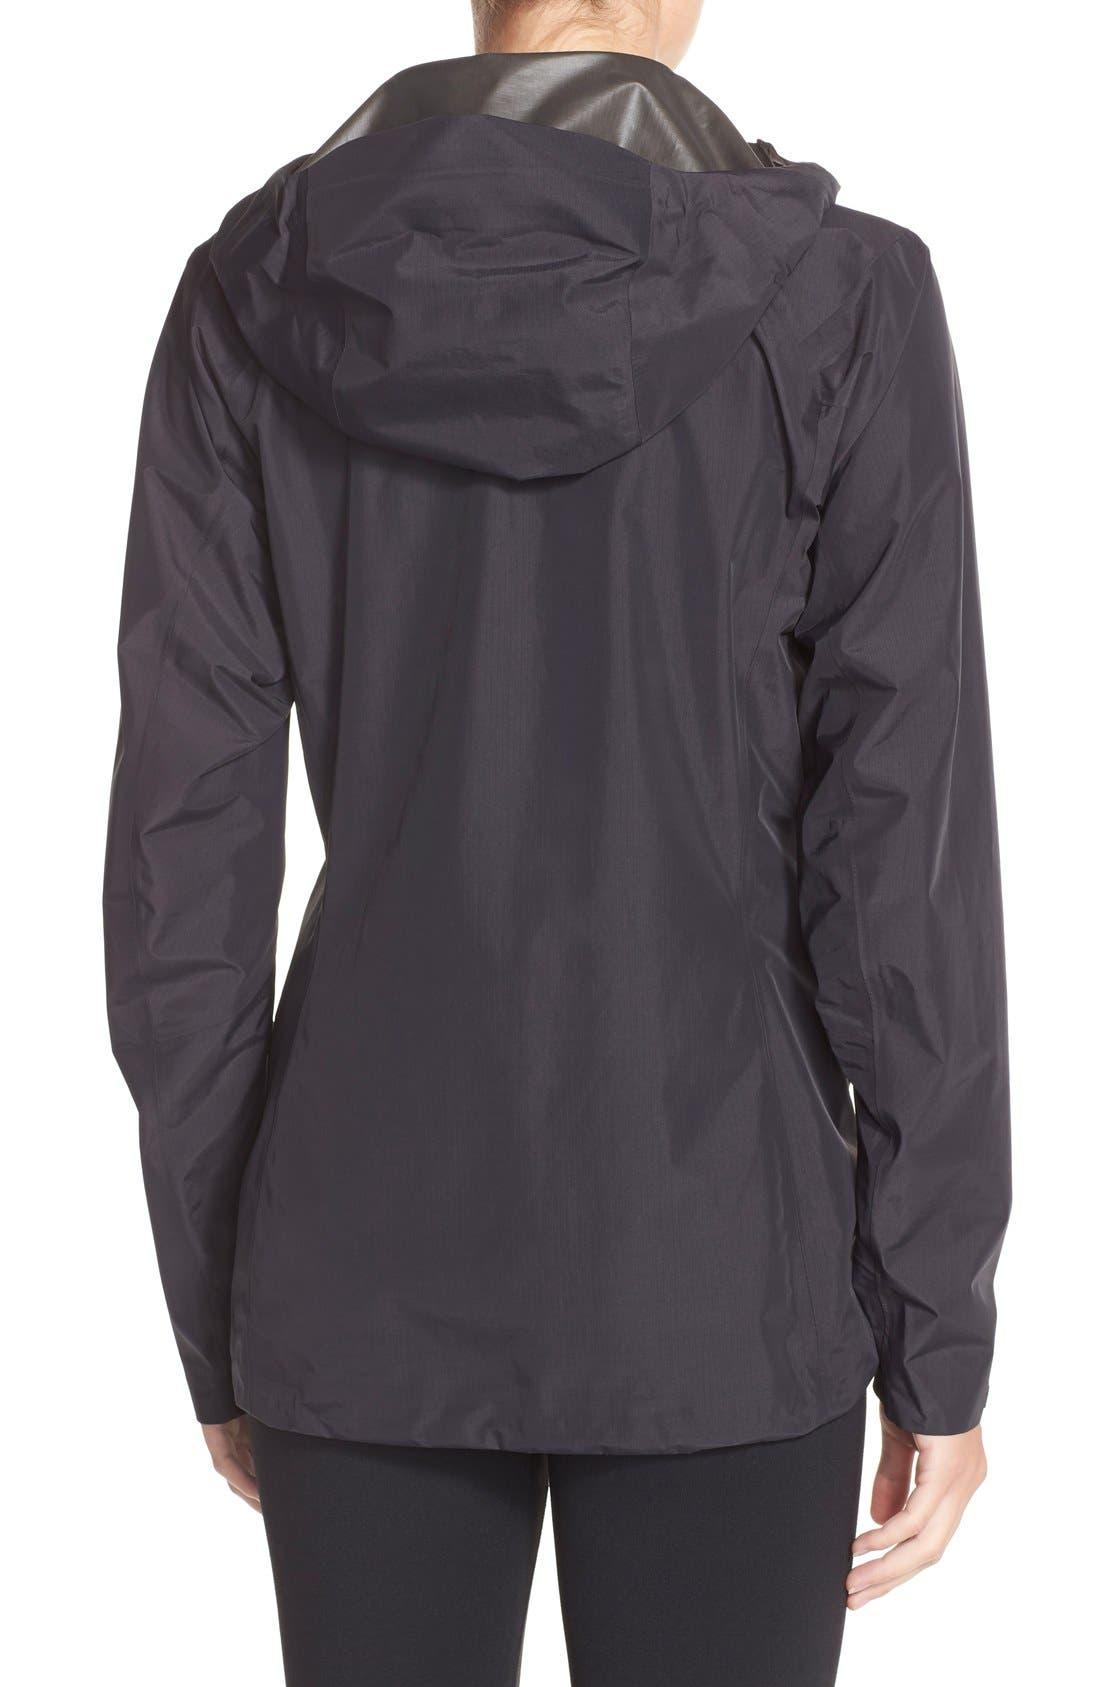 'Beta SL' Waterproof Jacket,                             Alternate thumbnail 2, color,                             001